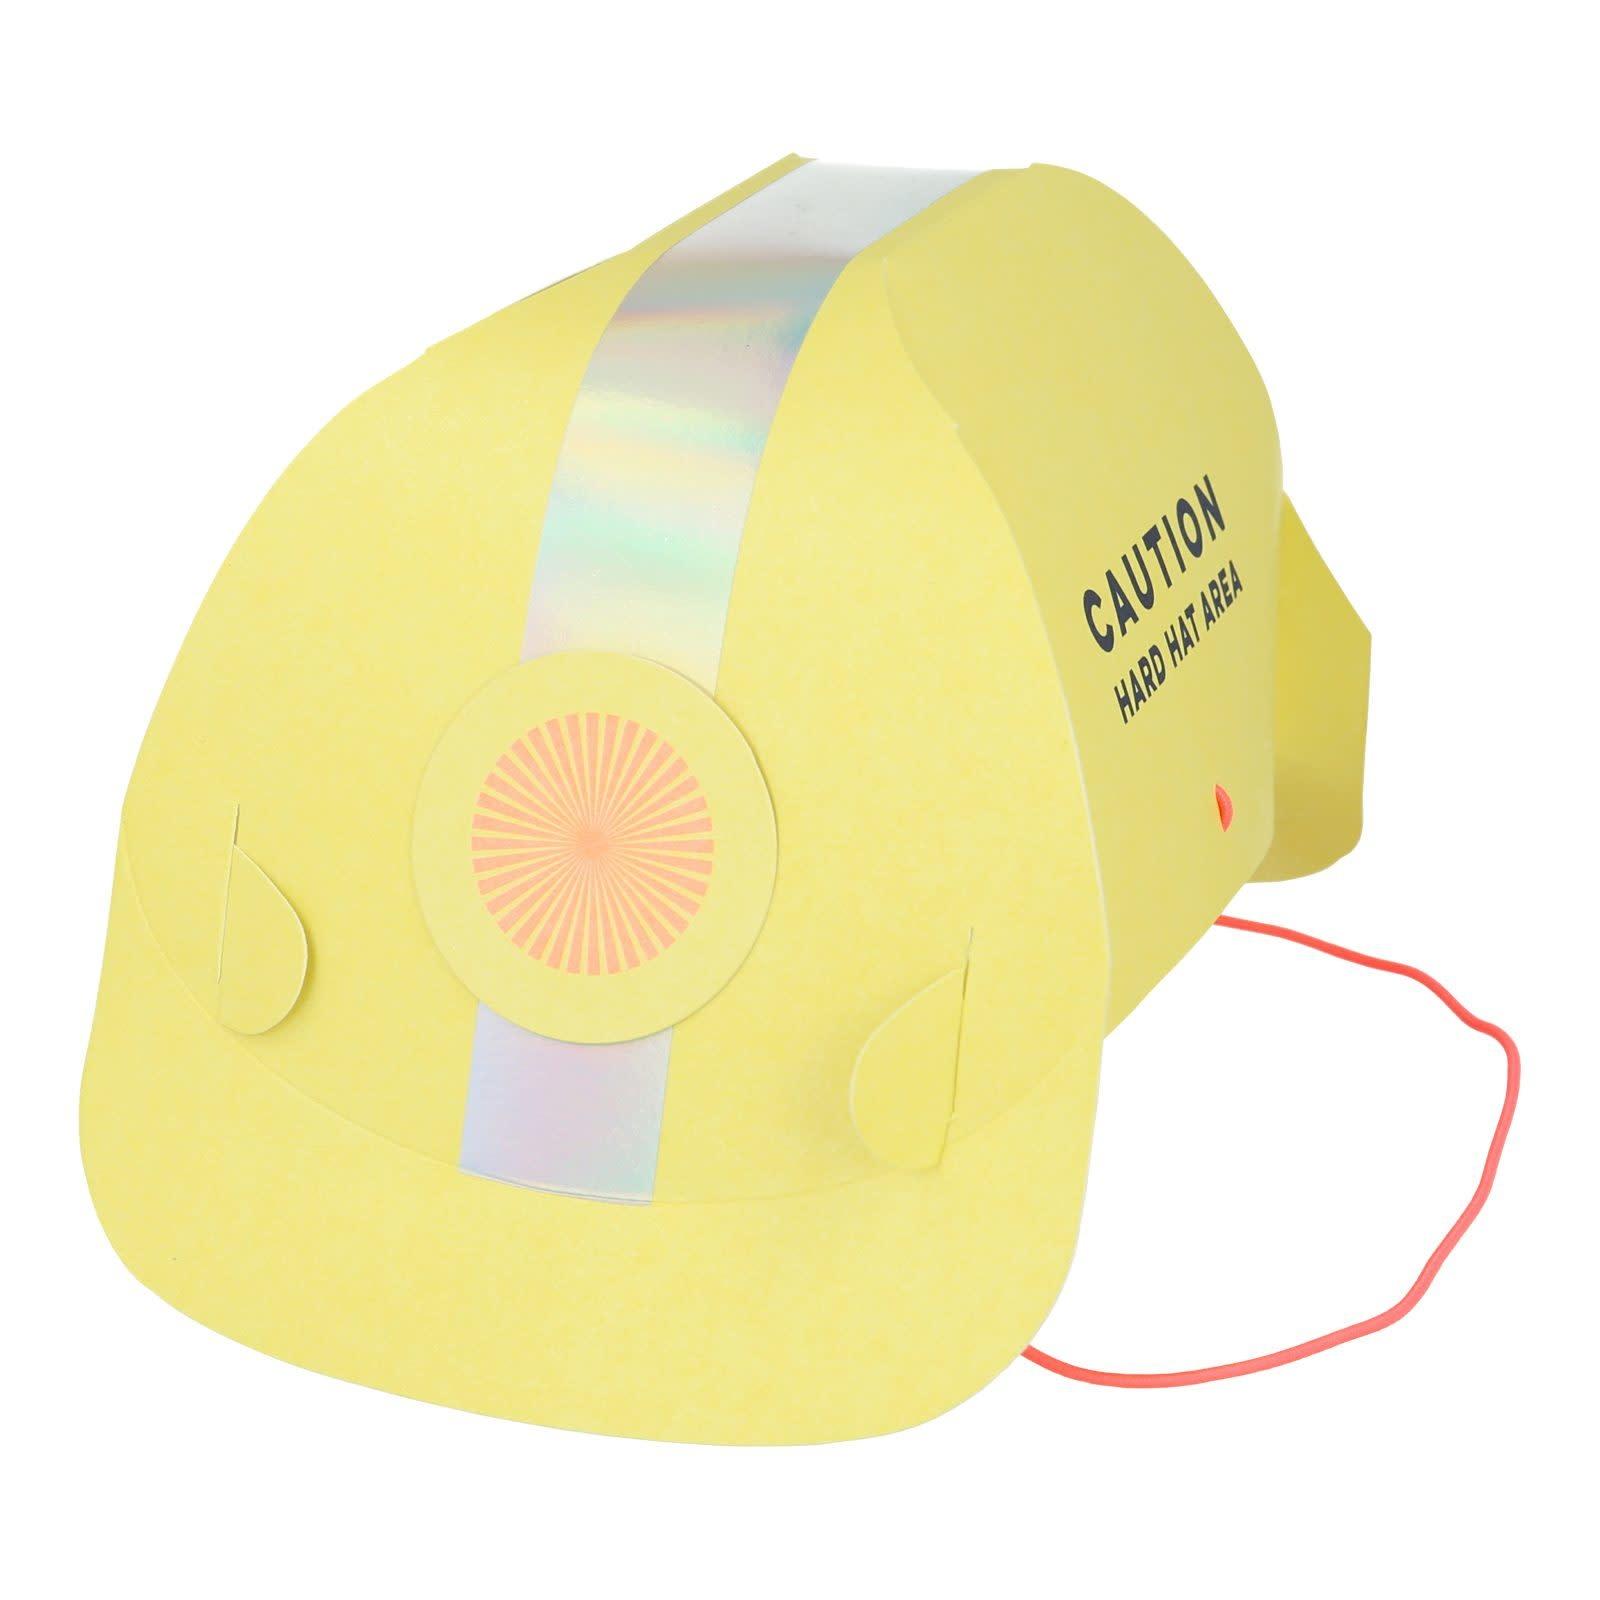 MERIMERI Construction party hats